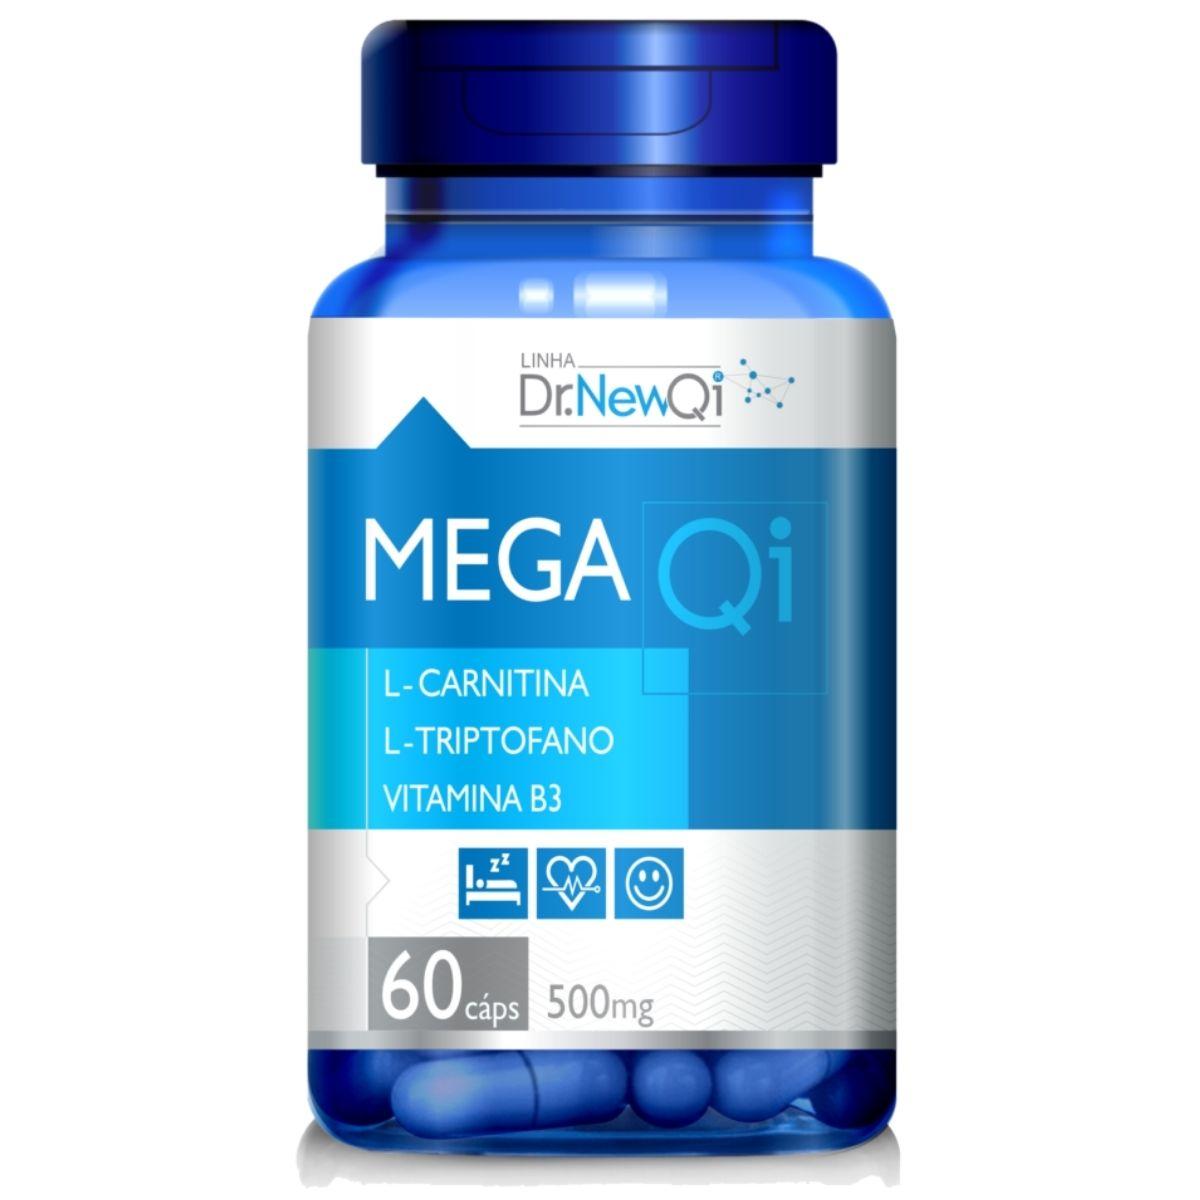 Mega Qi L-Triptofano + L-Carnitina + Vit. B3 500mg 60 Cápsulas - Upnutri